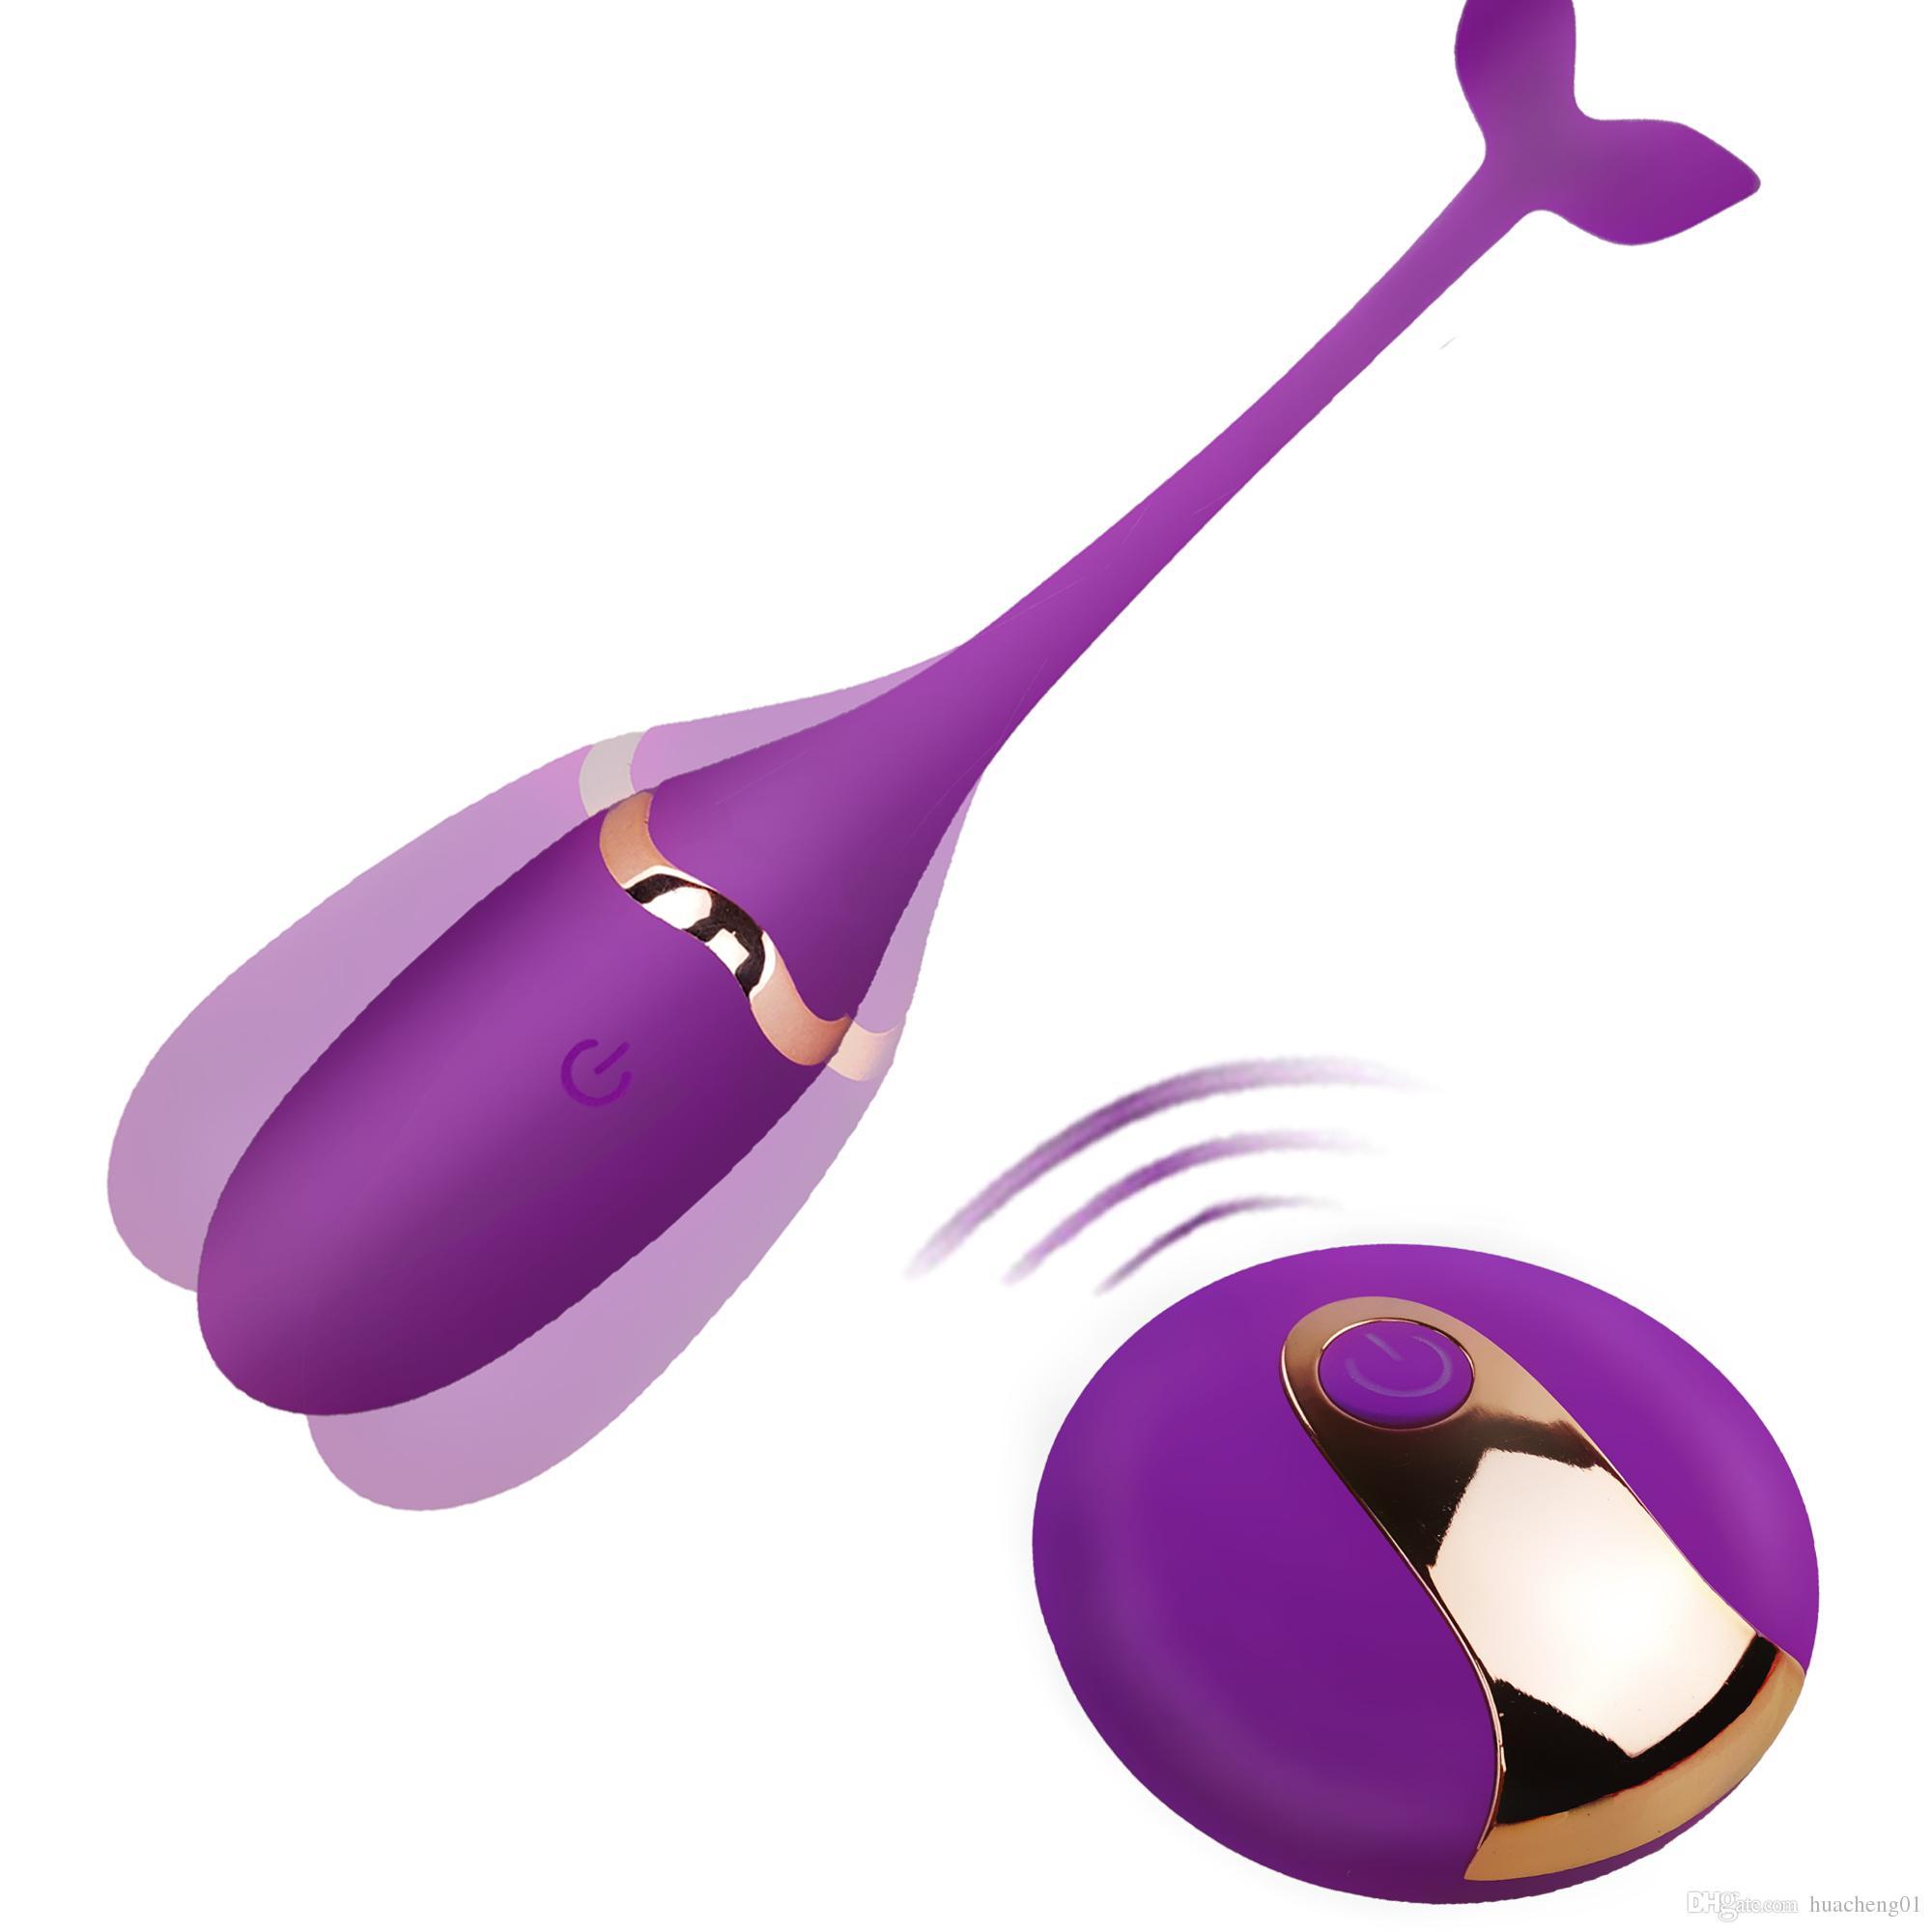 Sex Product Rechargeable Vibrating Jump Egg Remote Control Vibrators Sex Toys for Women Exercise Vaginal Kegal Ball G-spot Vibrator Massager